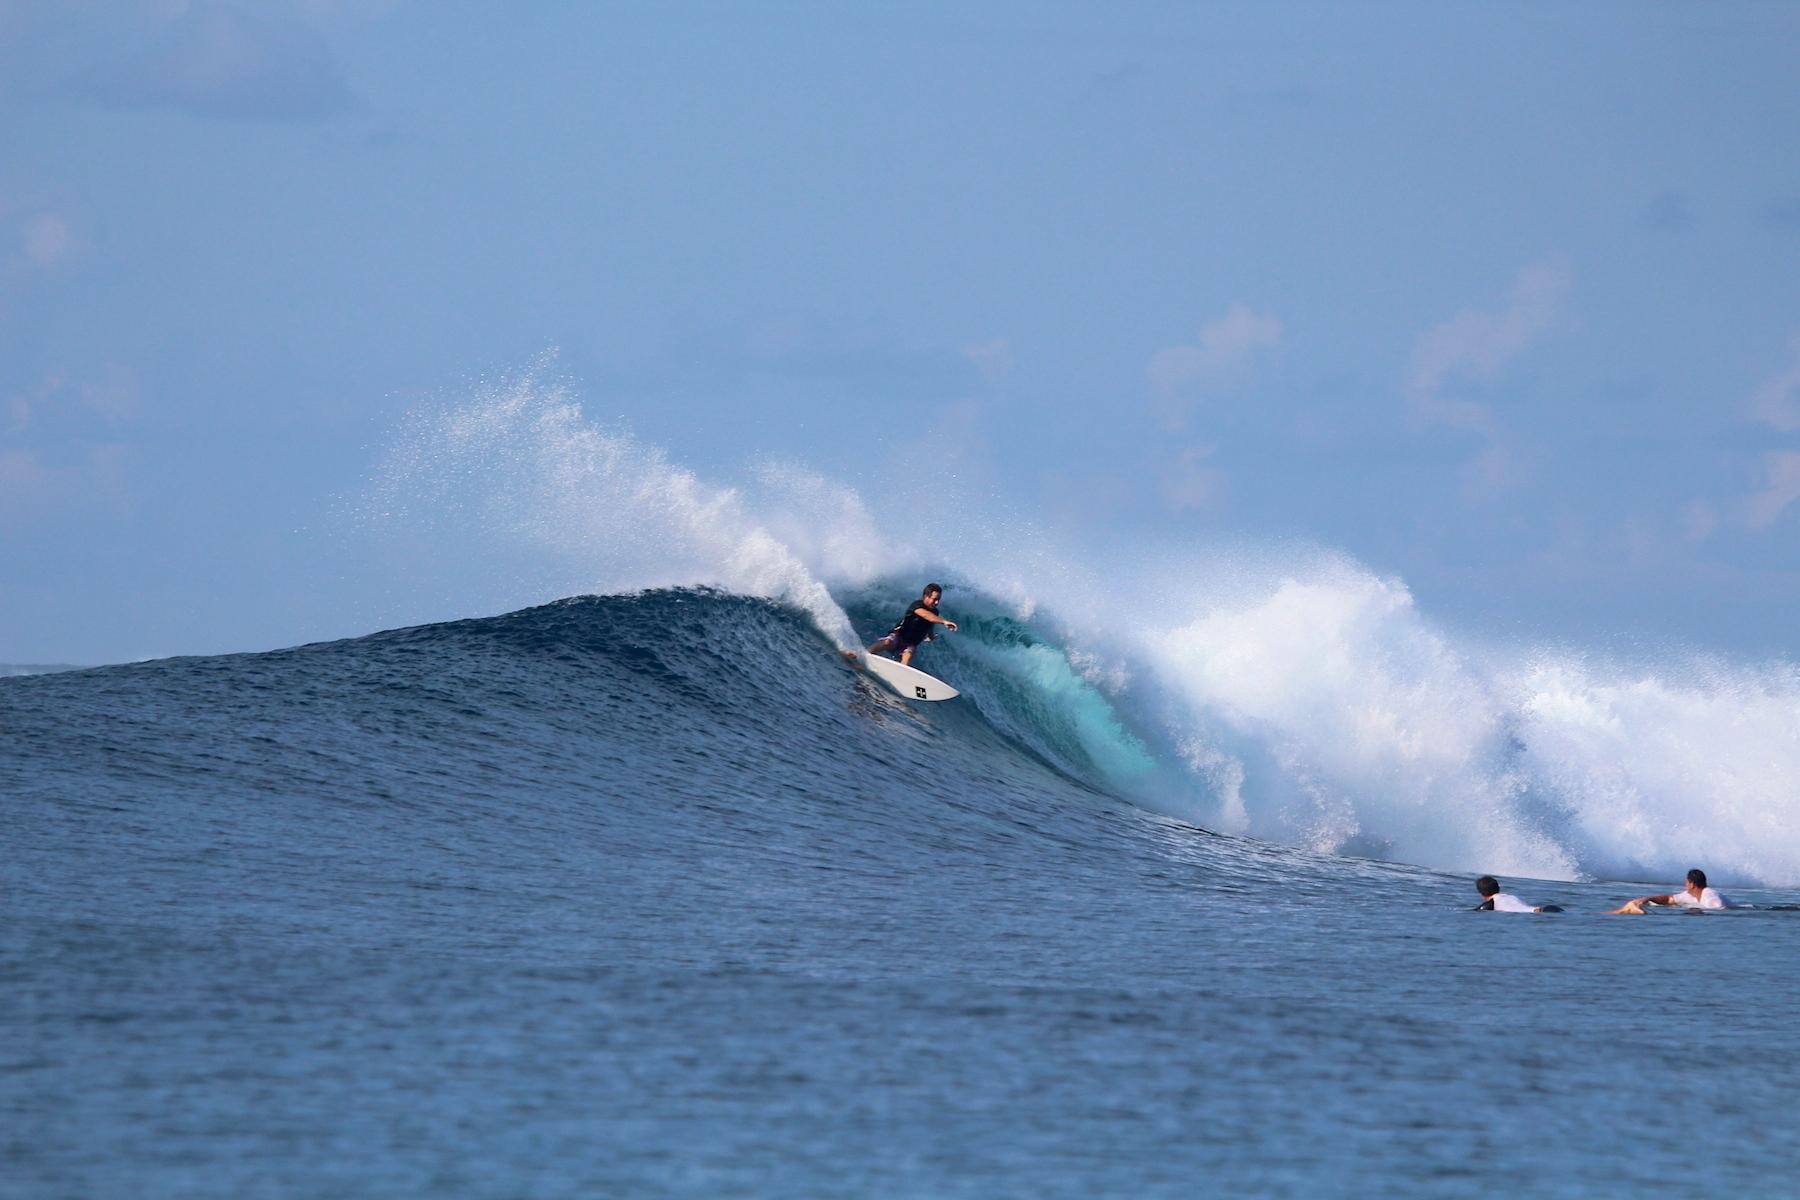 surfing, resort, Telo Islands, Sumatra, rlz, family friendly, holiday, surf report, Nias, Indonesia